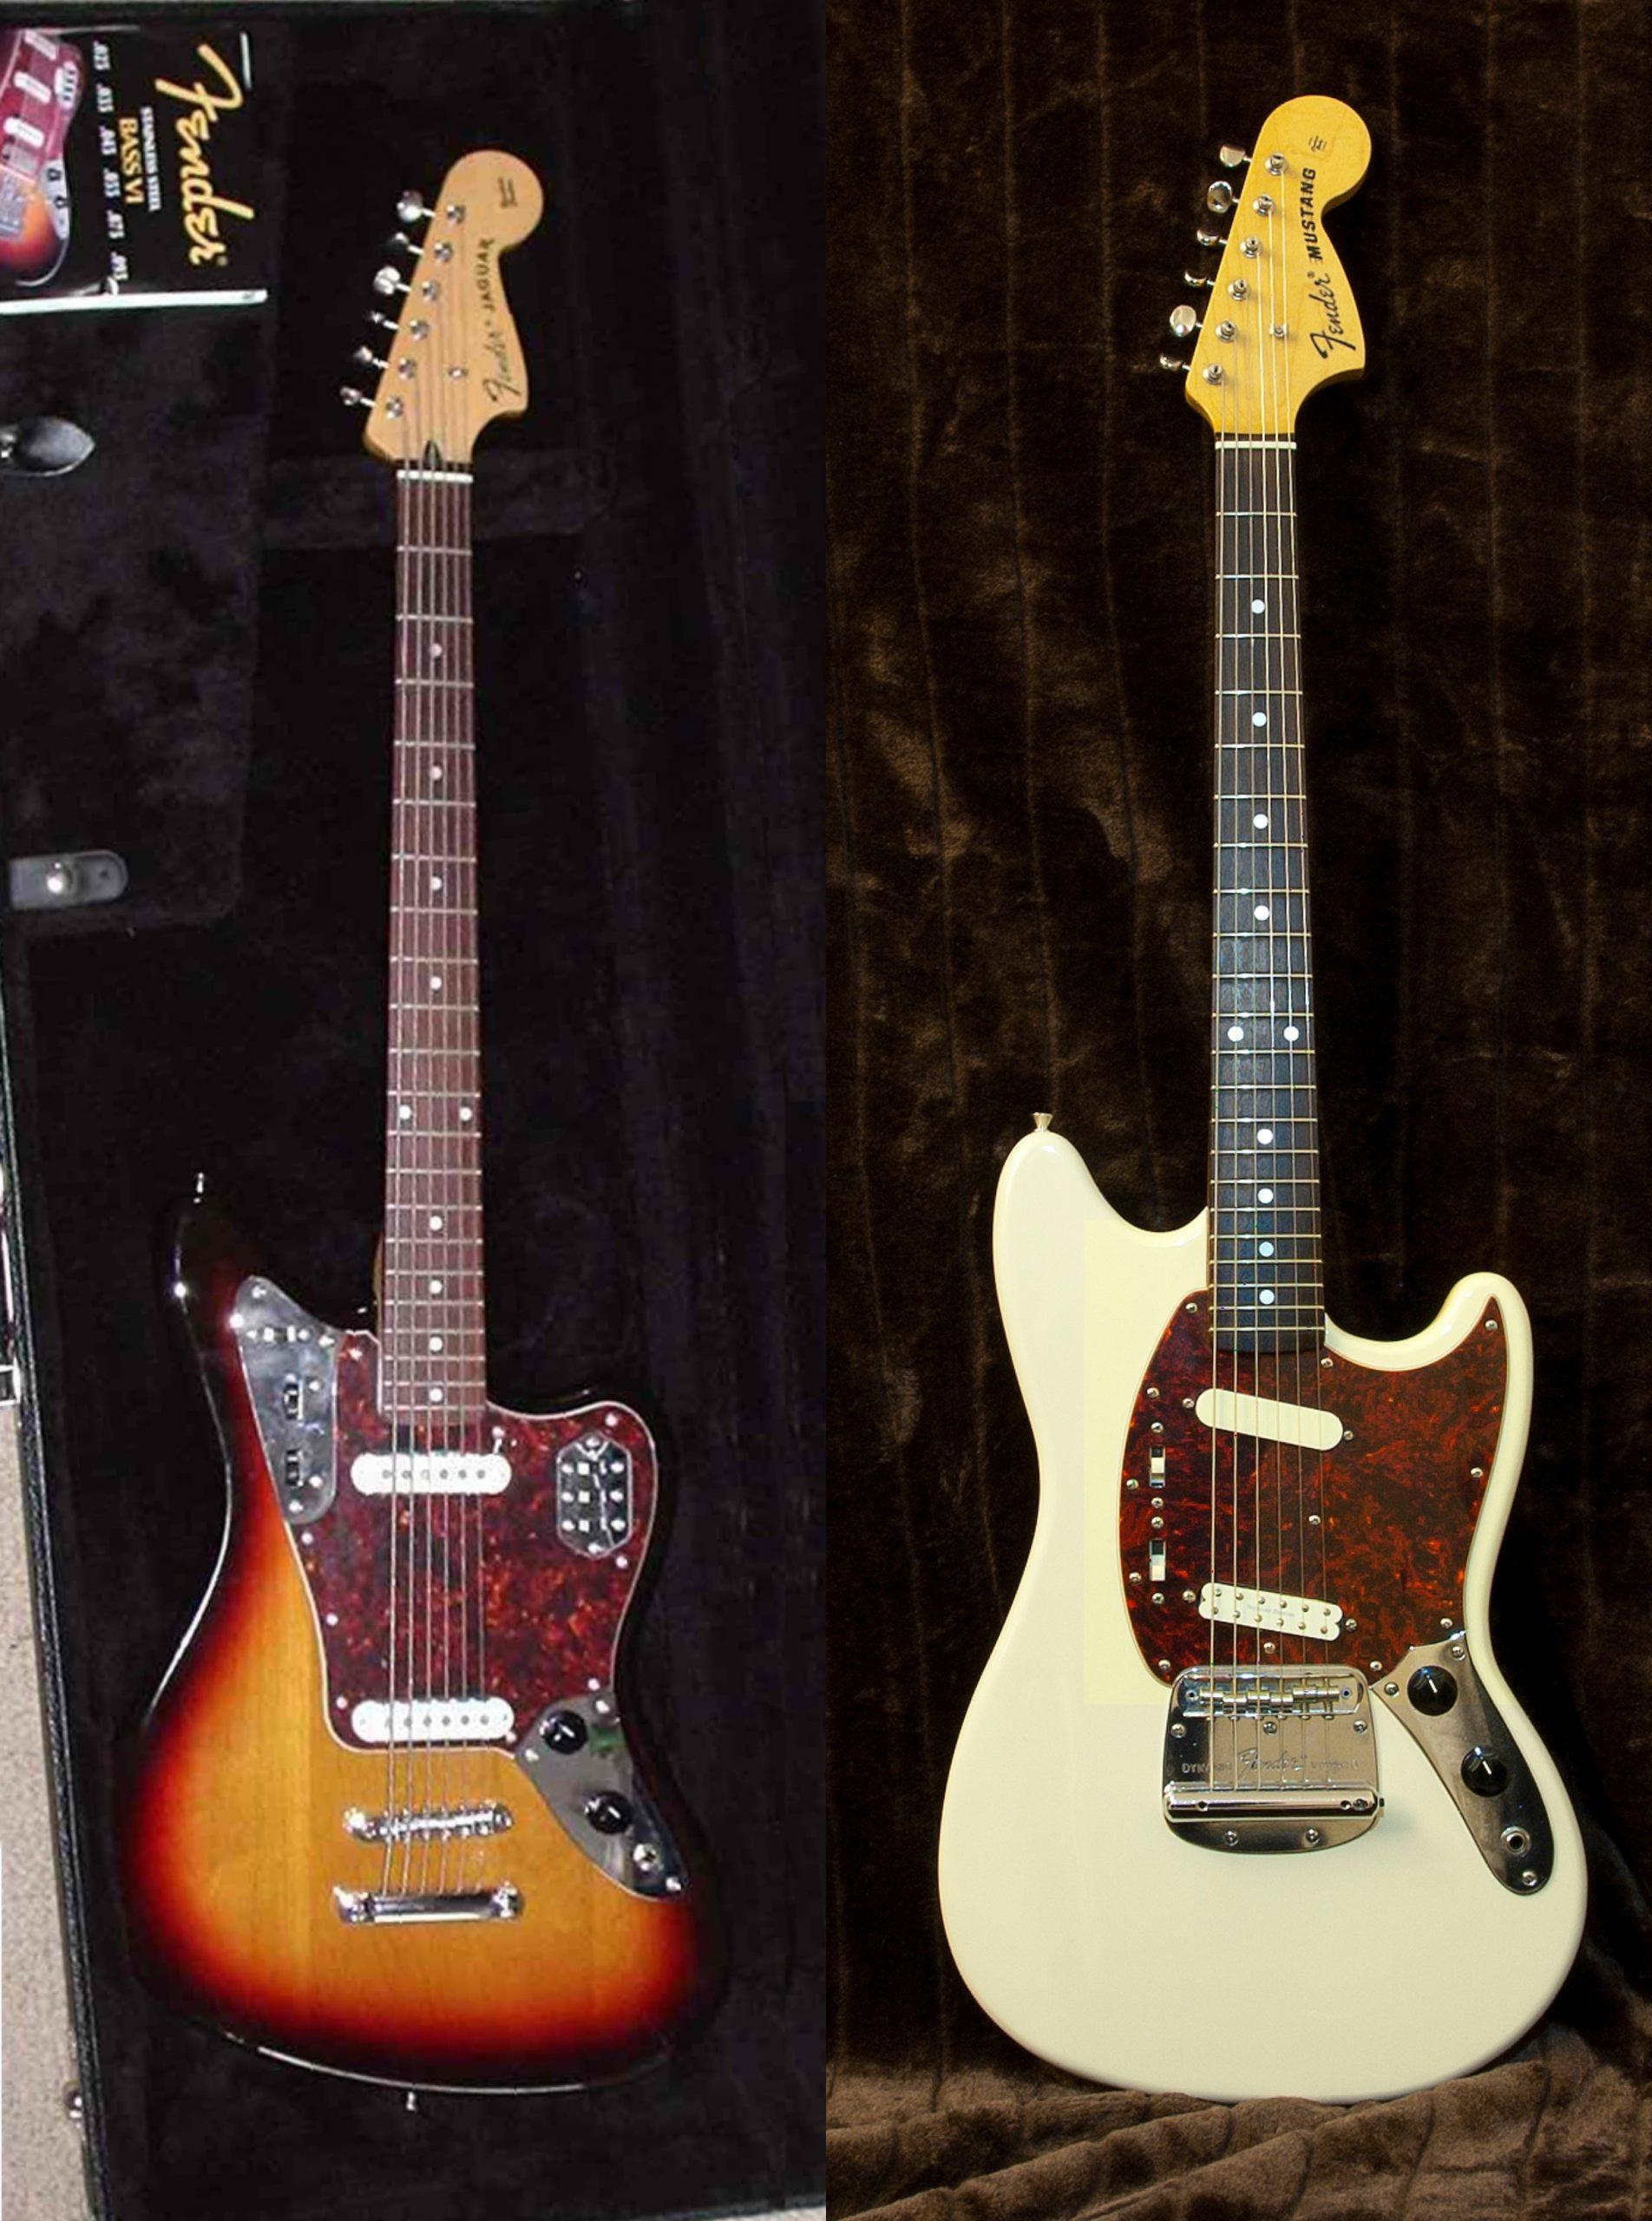 Guitarras Jaguar Y Mustang